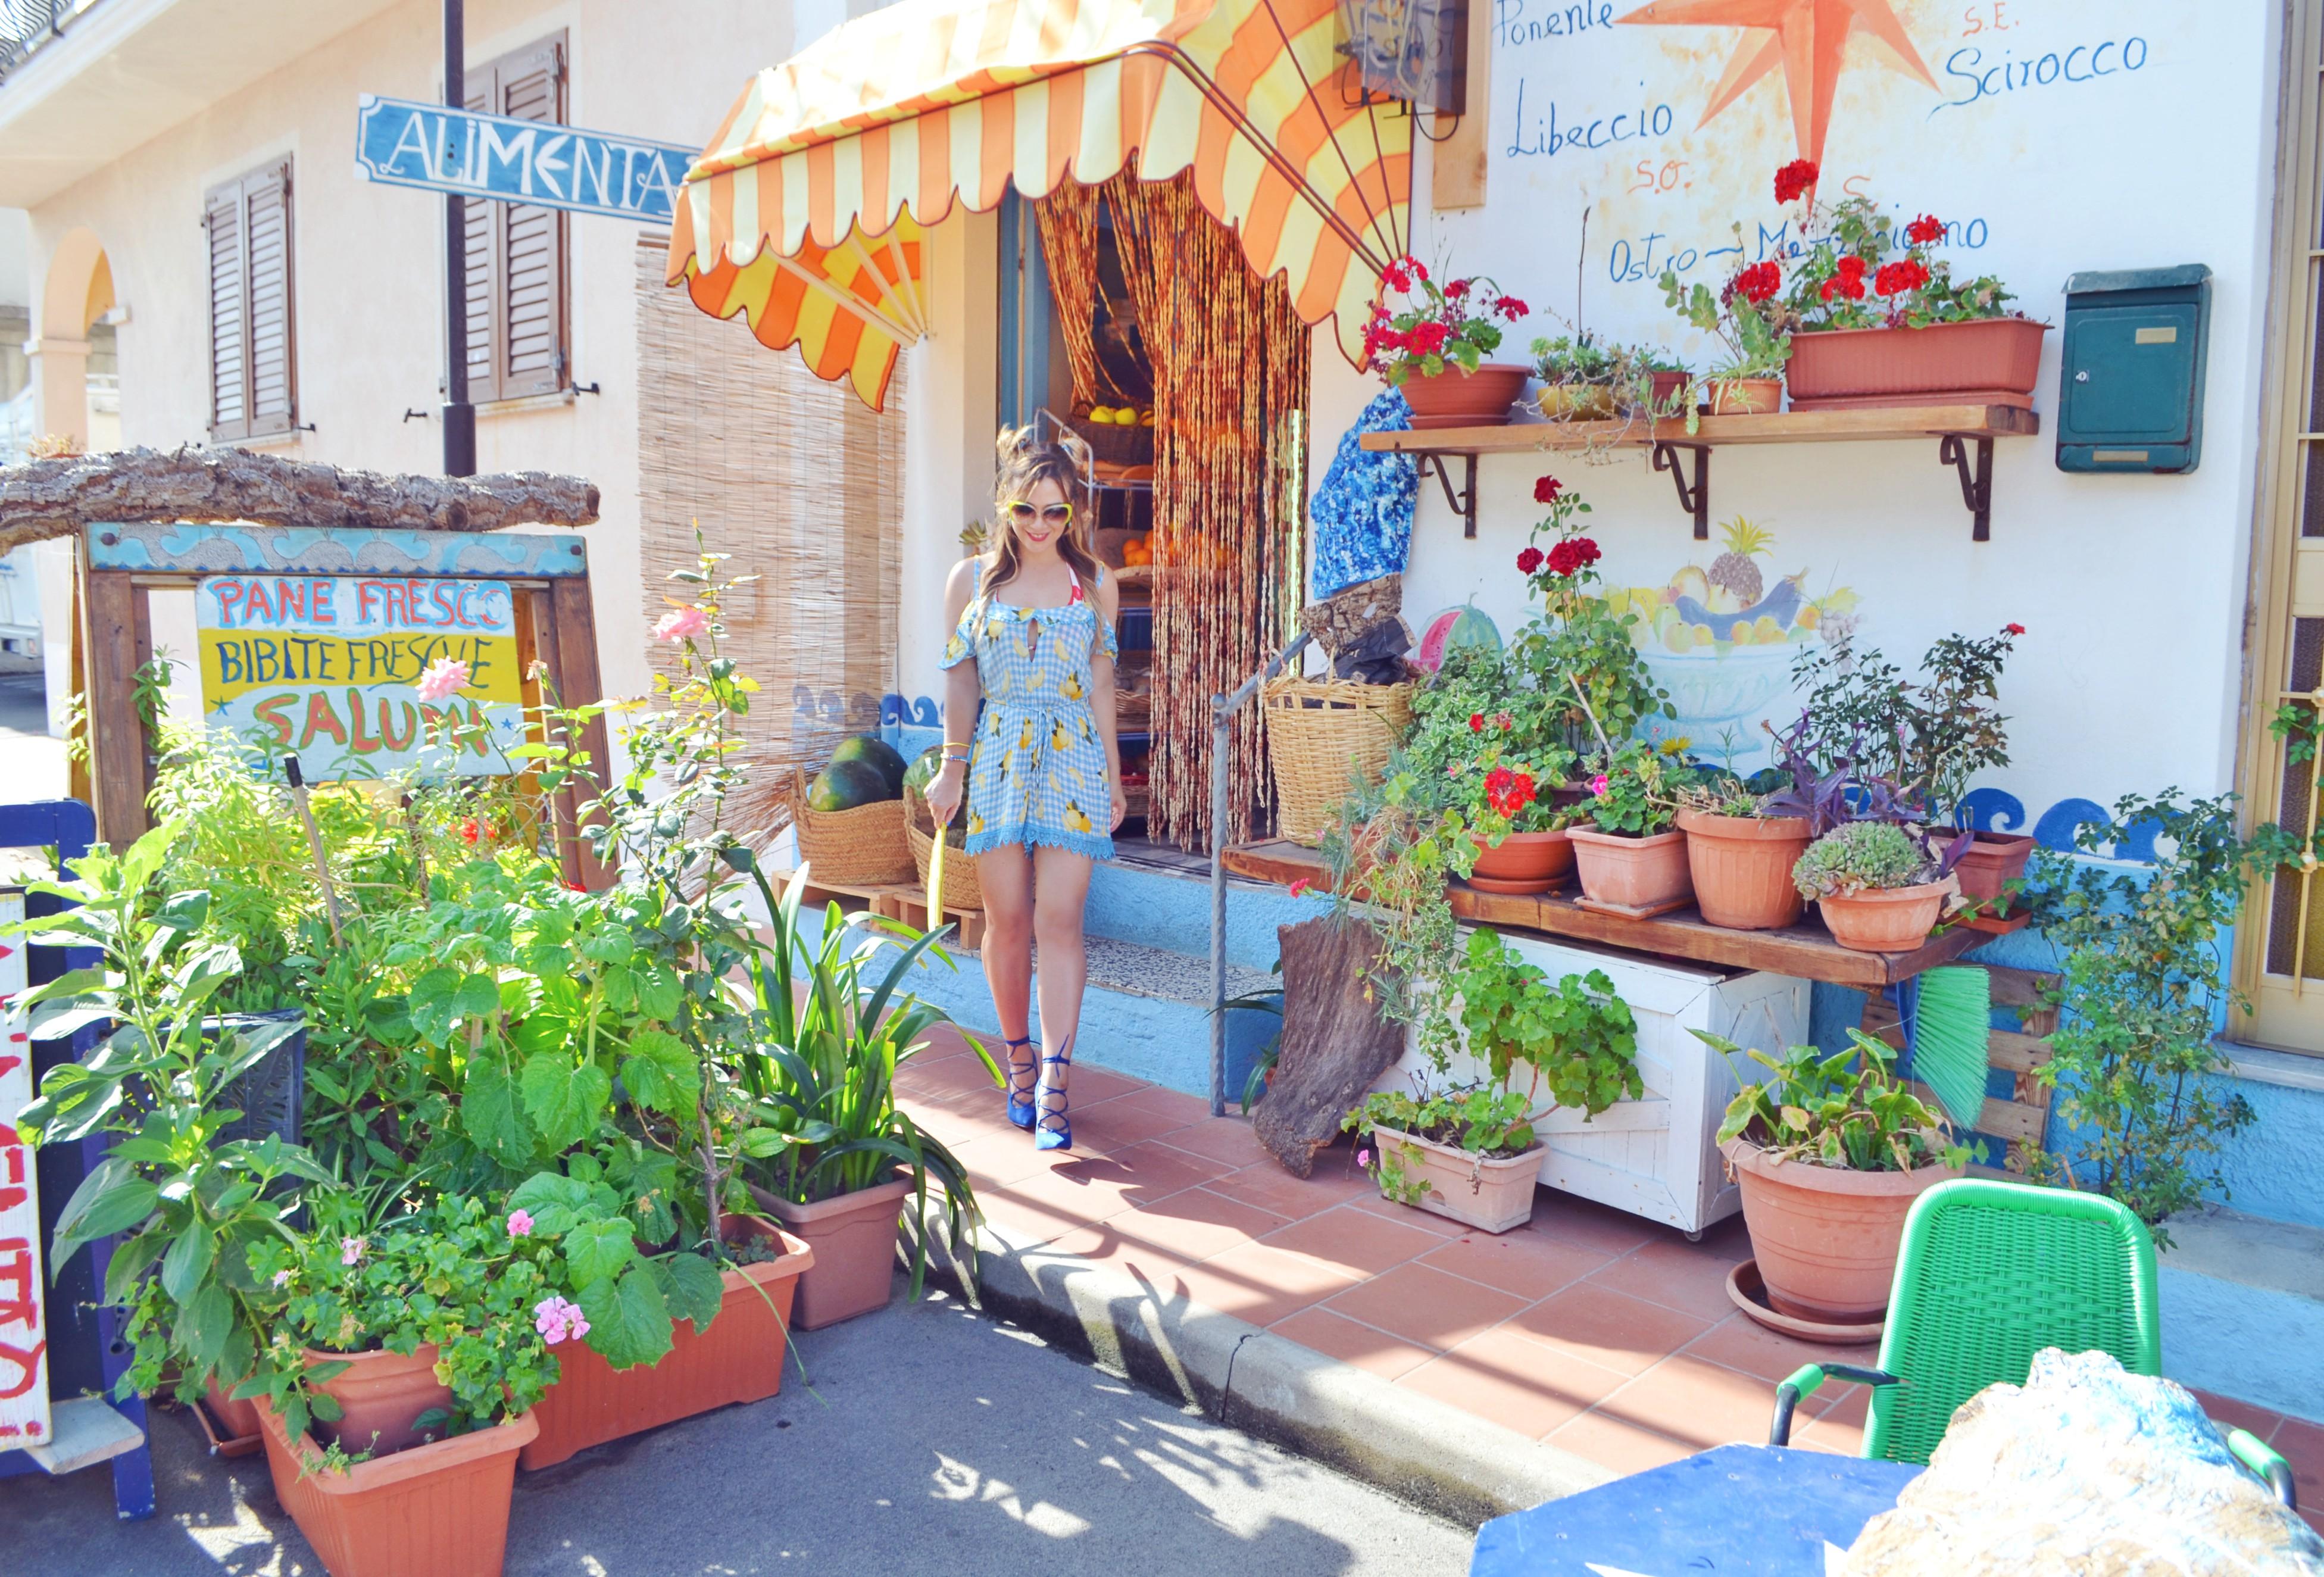 Sardegna-street-style-blog-de-moda-ChicAdicta-influencer-Chic-Adicta-lemons-print-estampado-de-limones-fashion-travel-PiensaenChic-Piensa-en-Chic